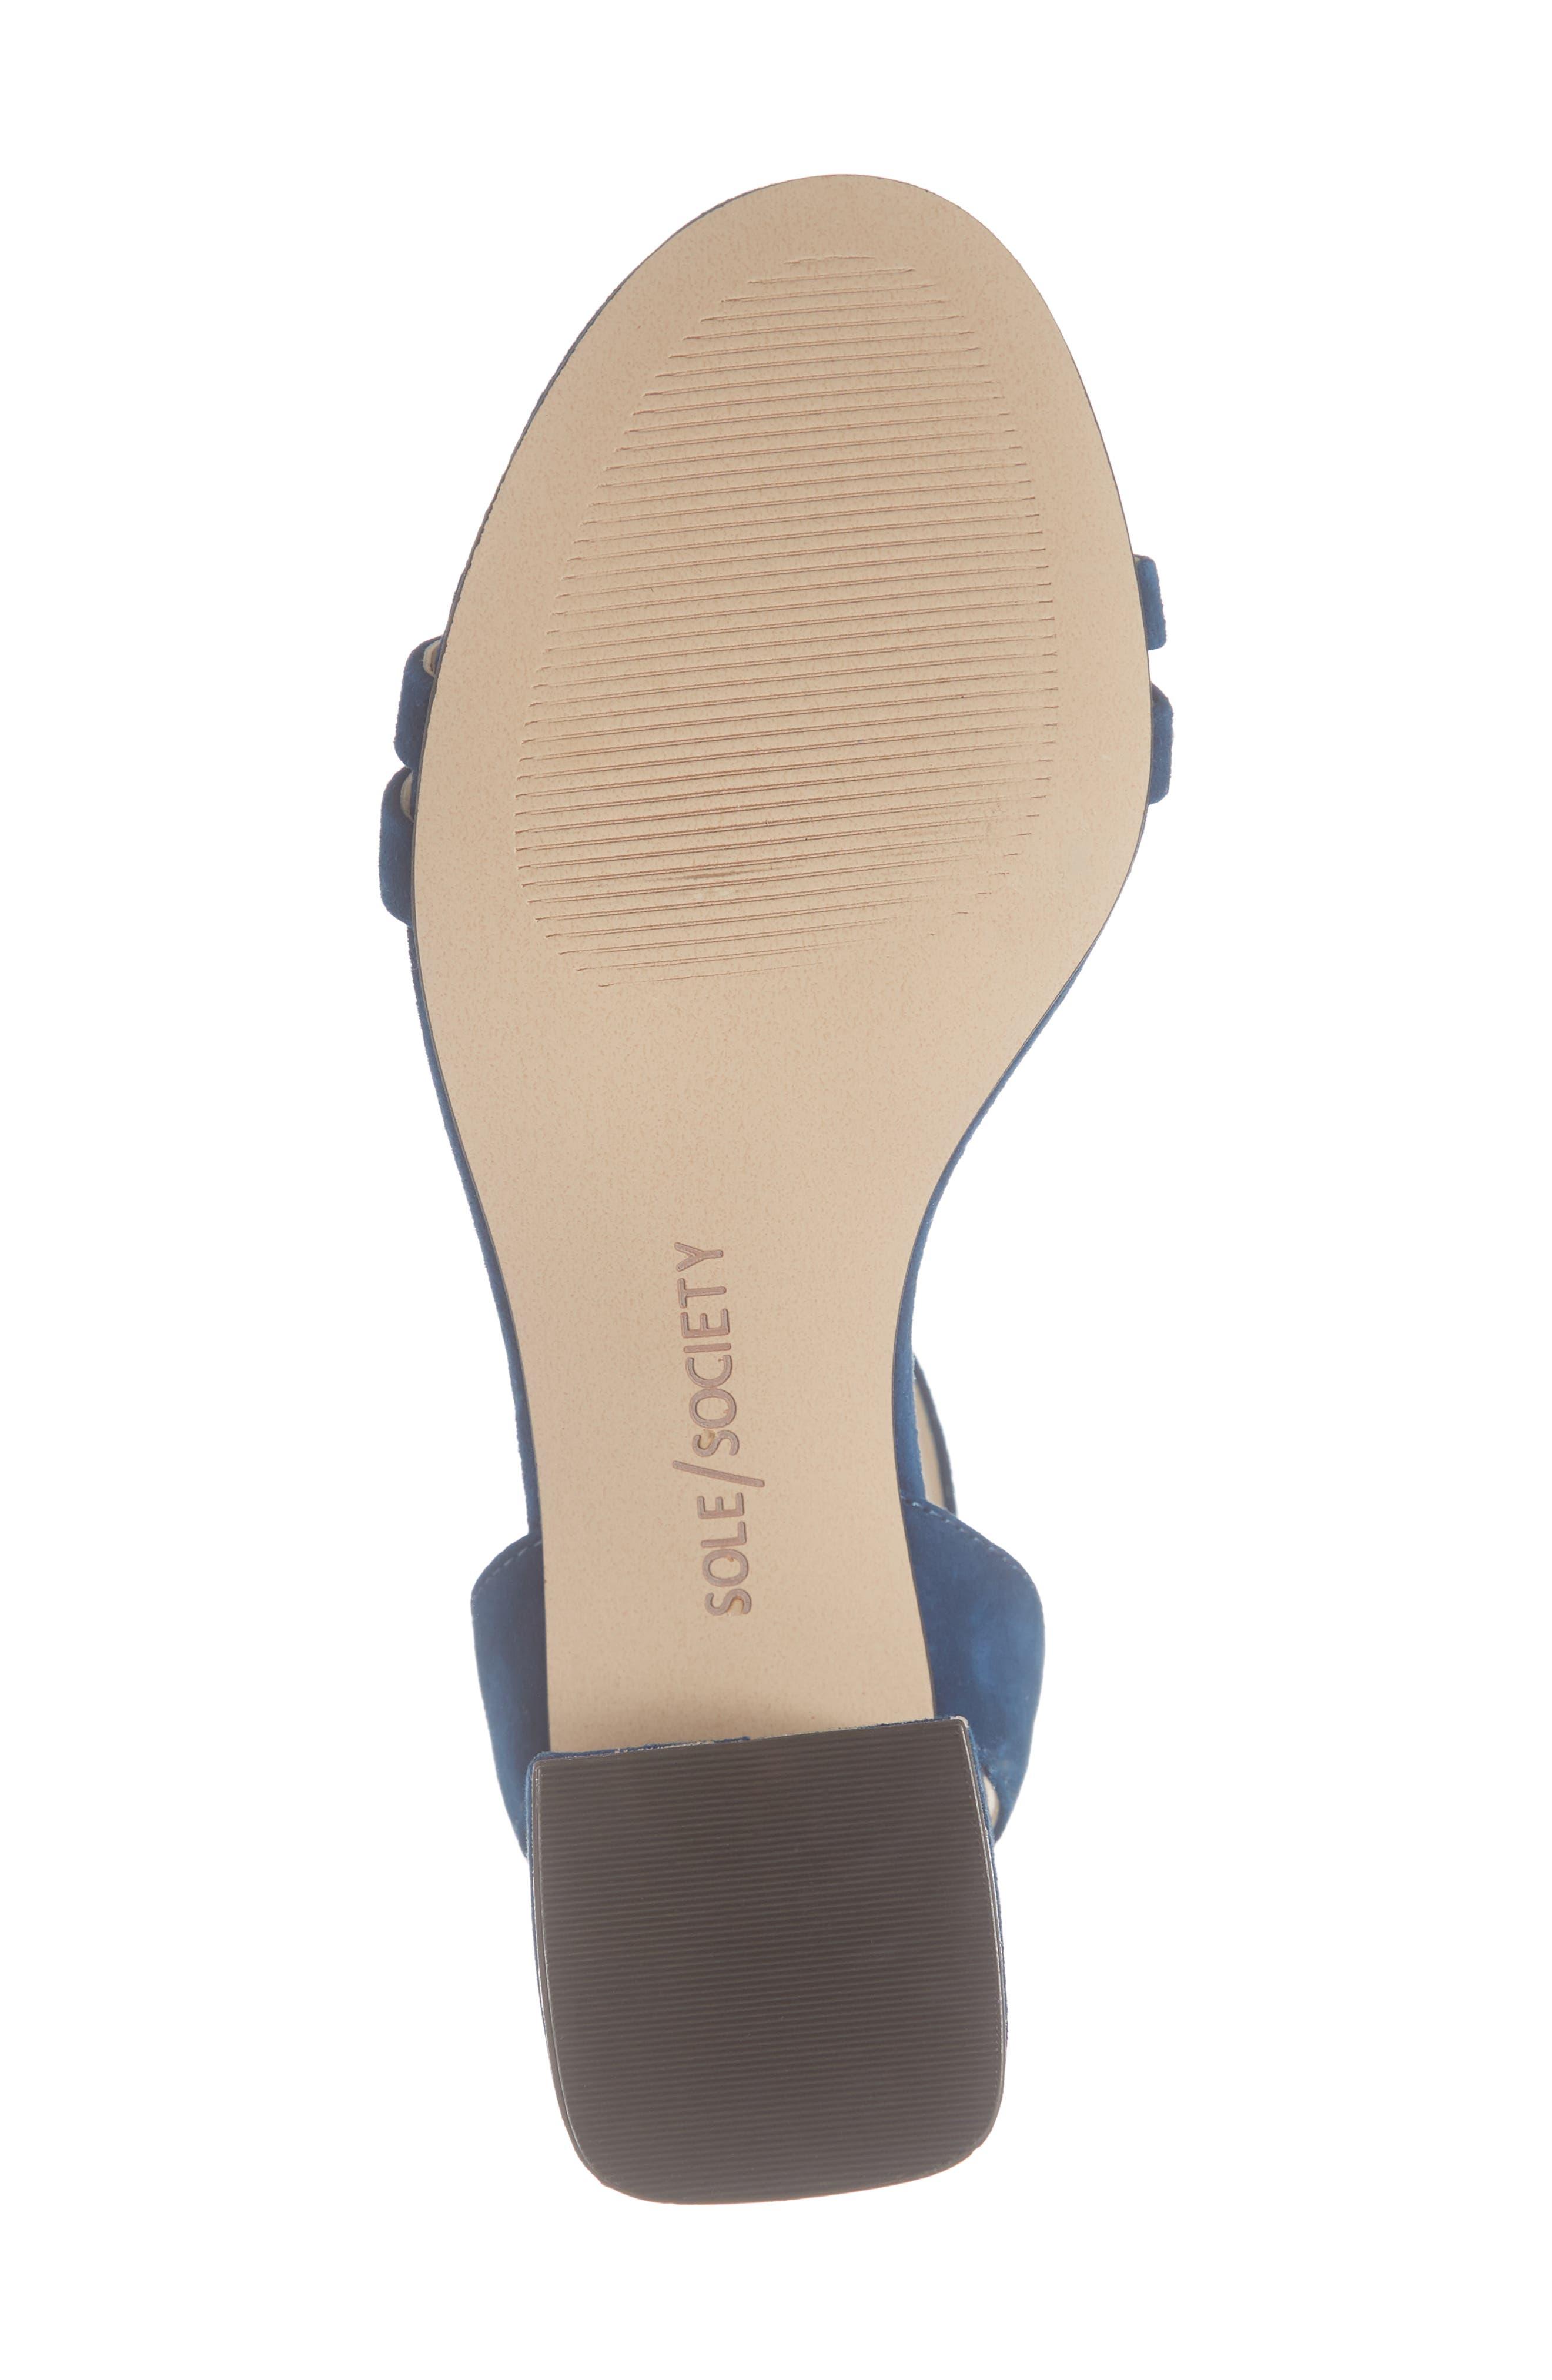 Hezzter Studded Sandal,                             Alternate thumbnail 6, color,                             CERULEAN BLUE SUEDE